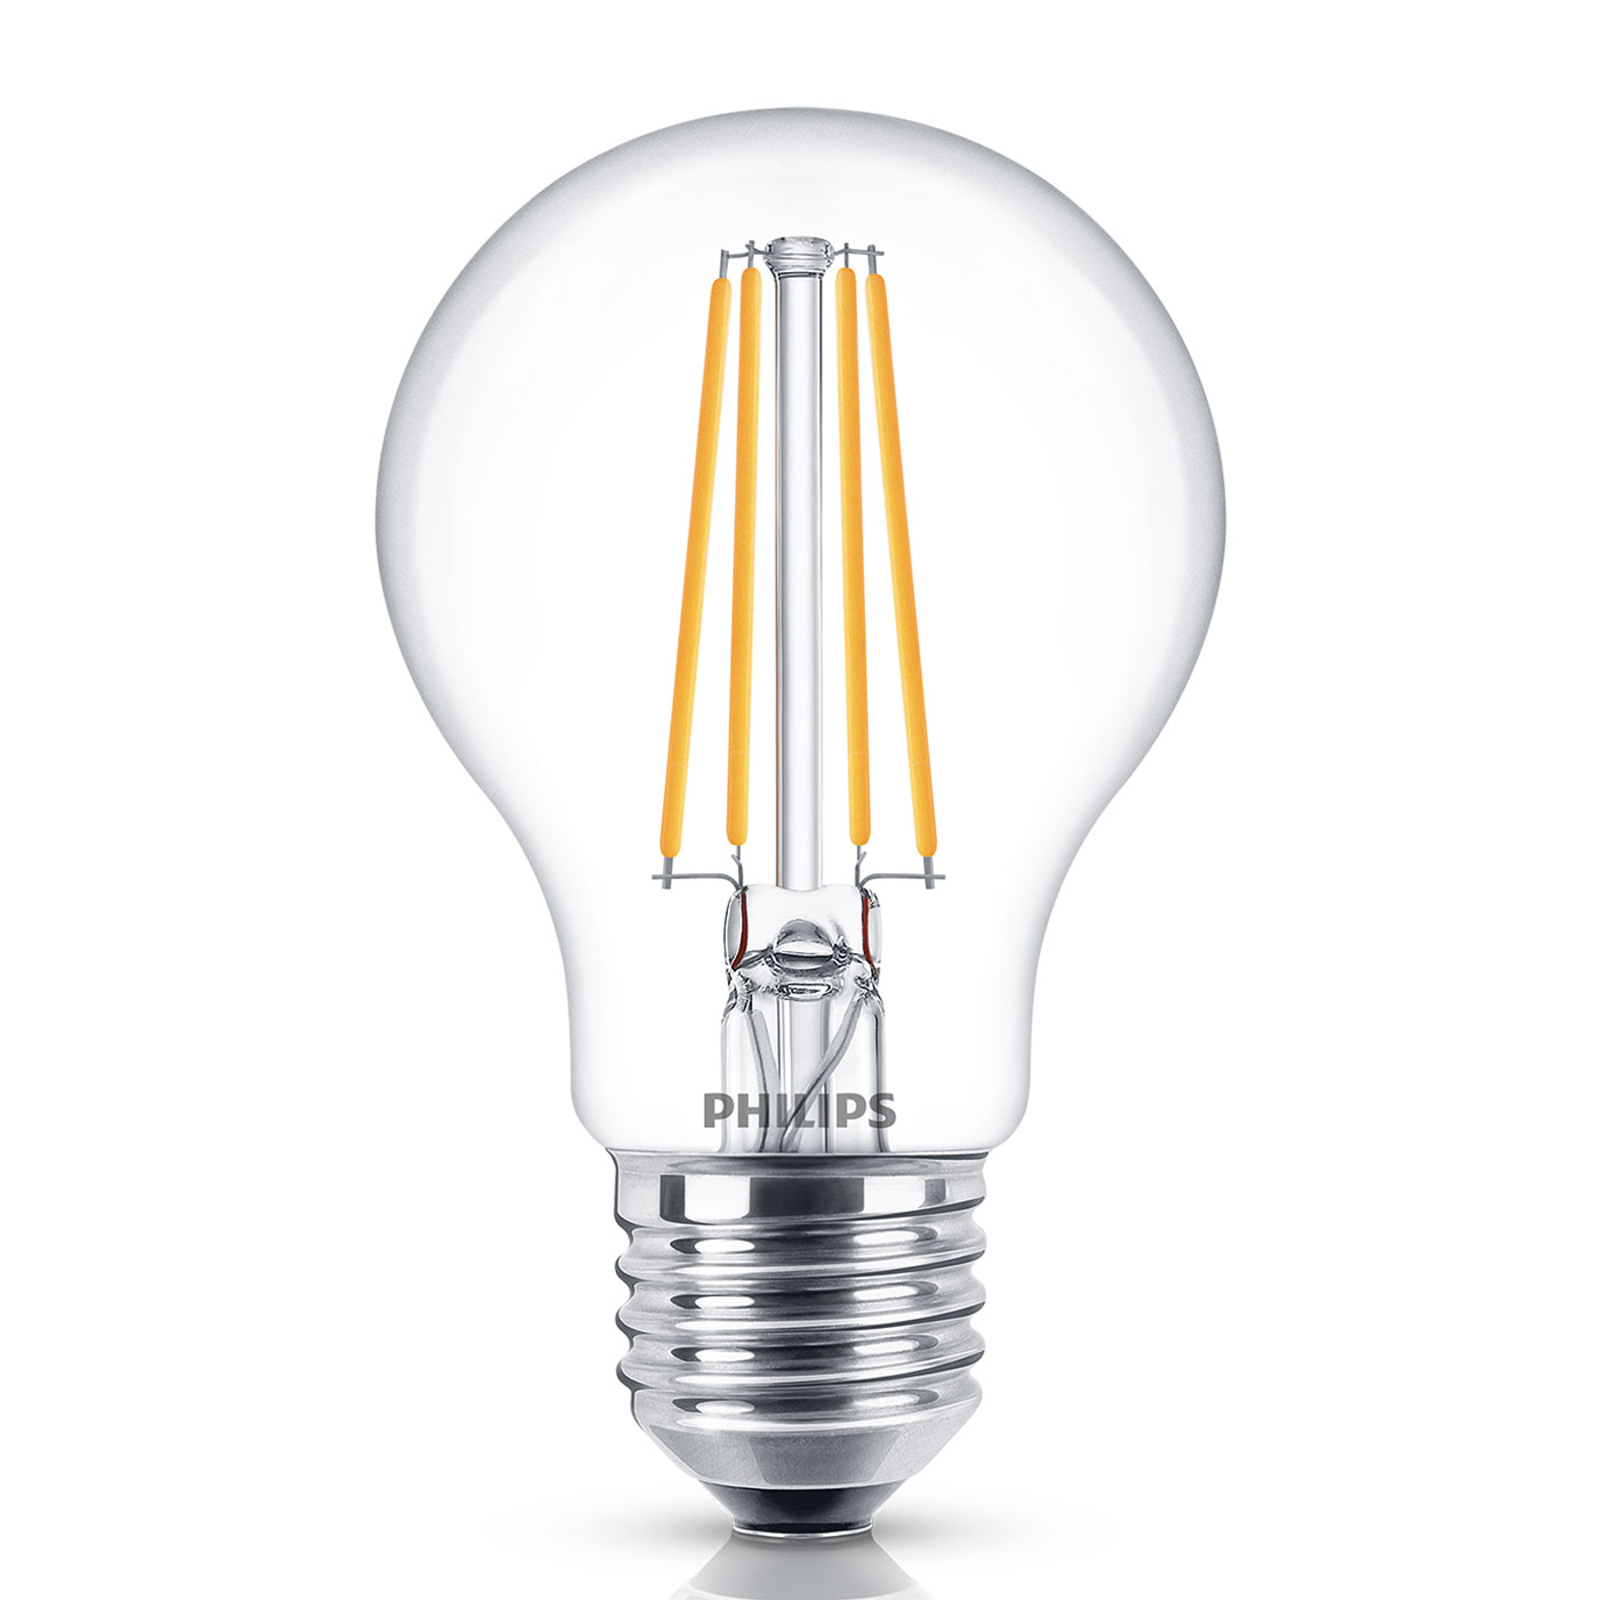 Philips Classic ampoule LED E27 A60 7W 4000K